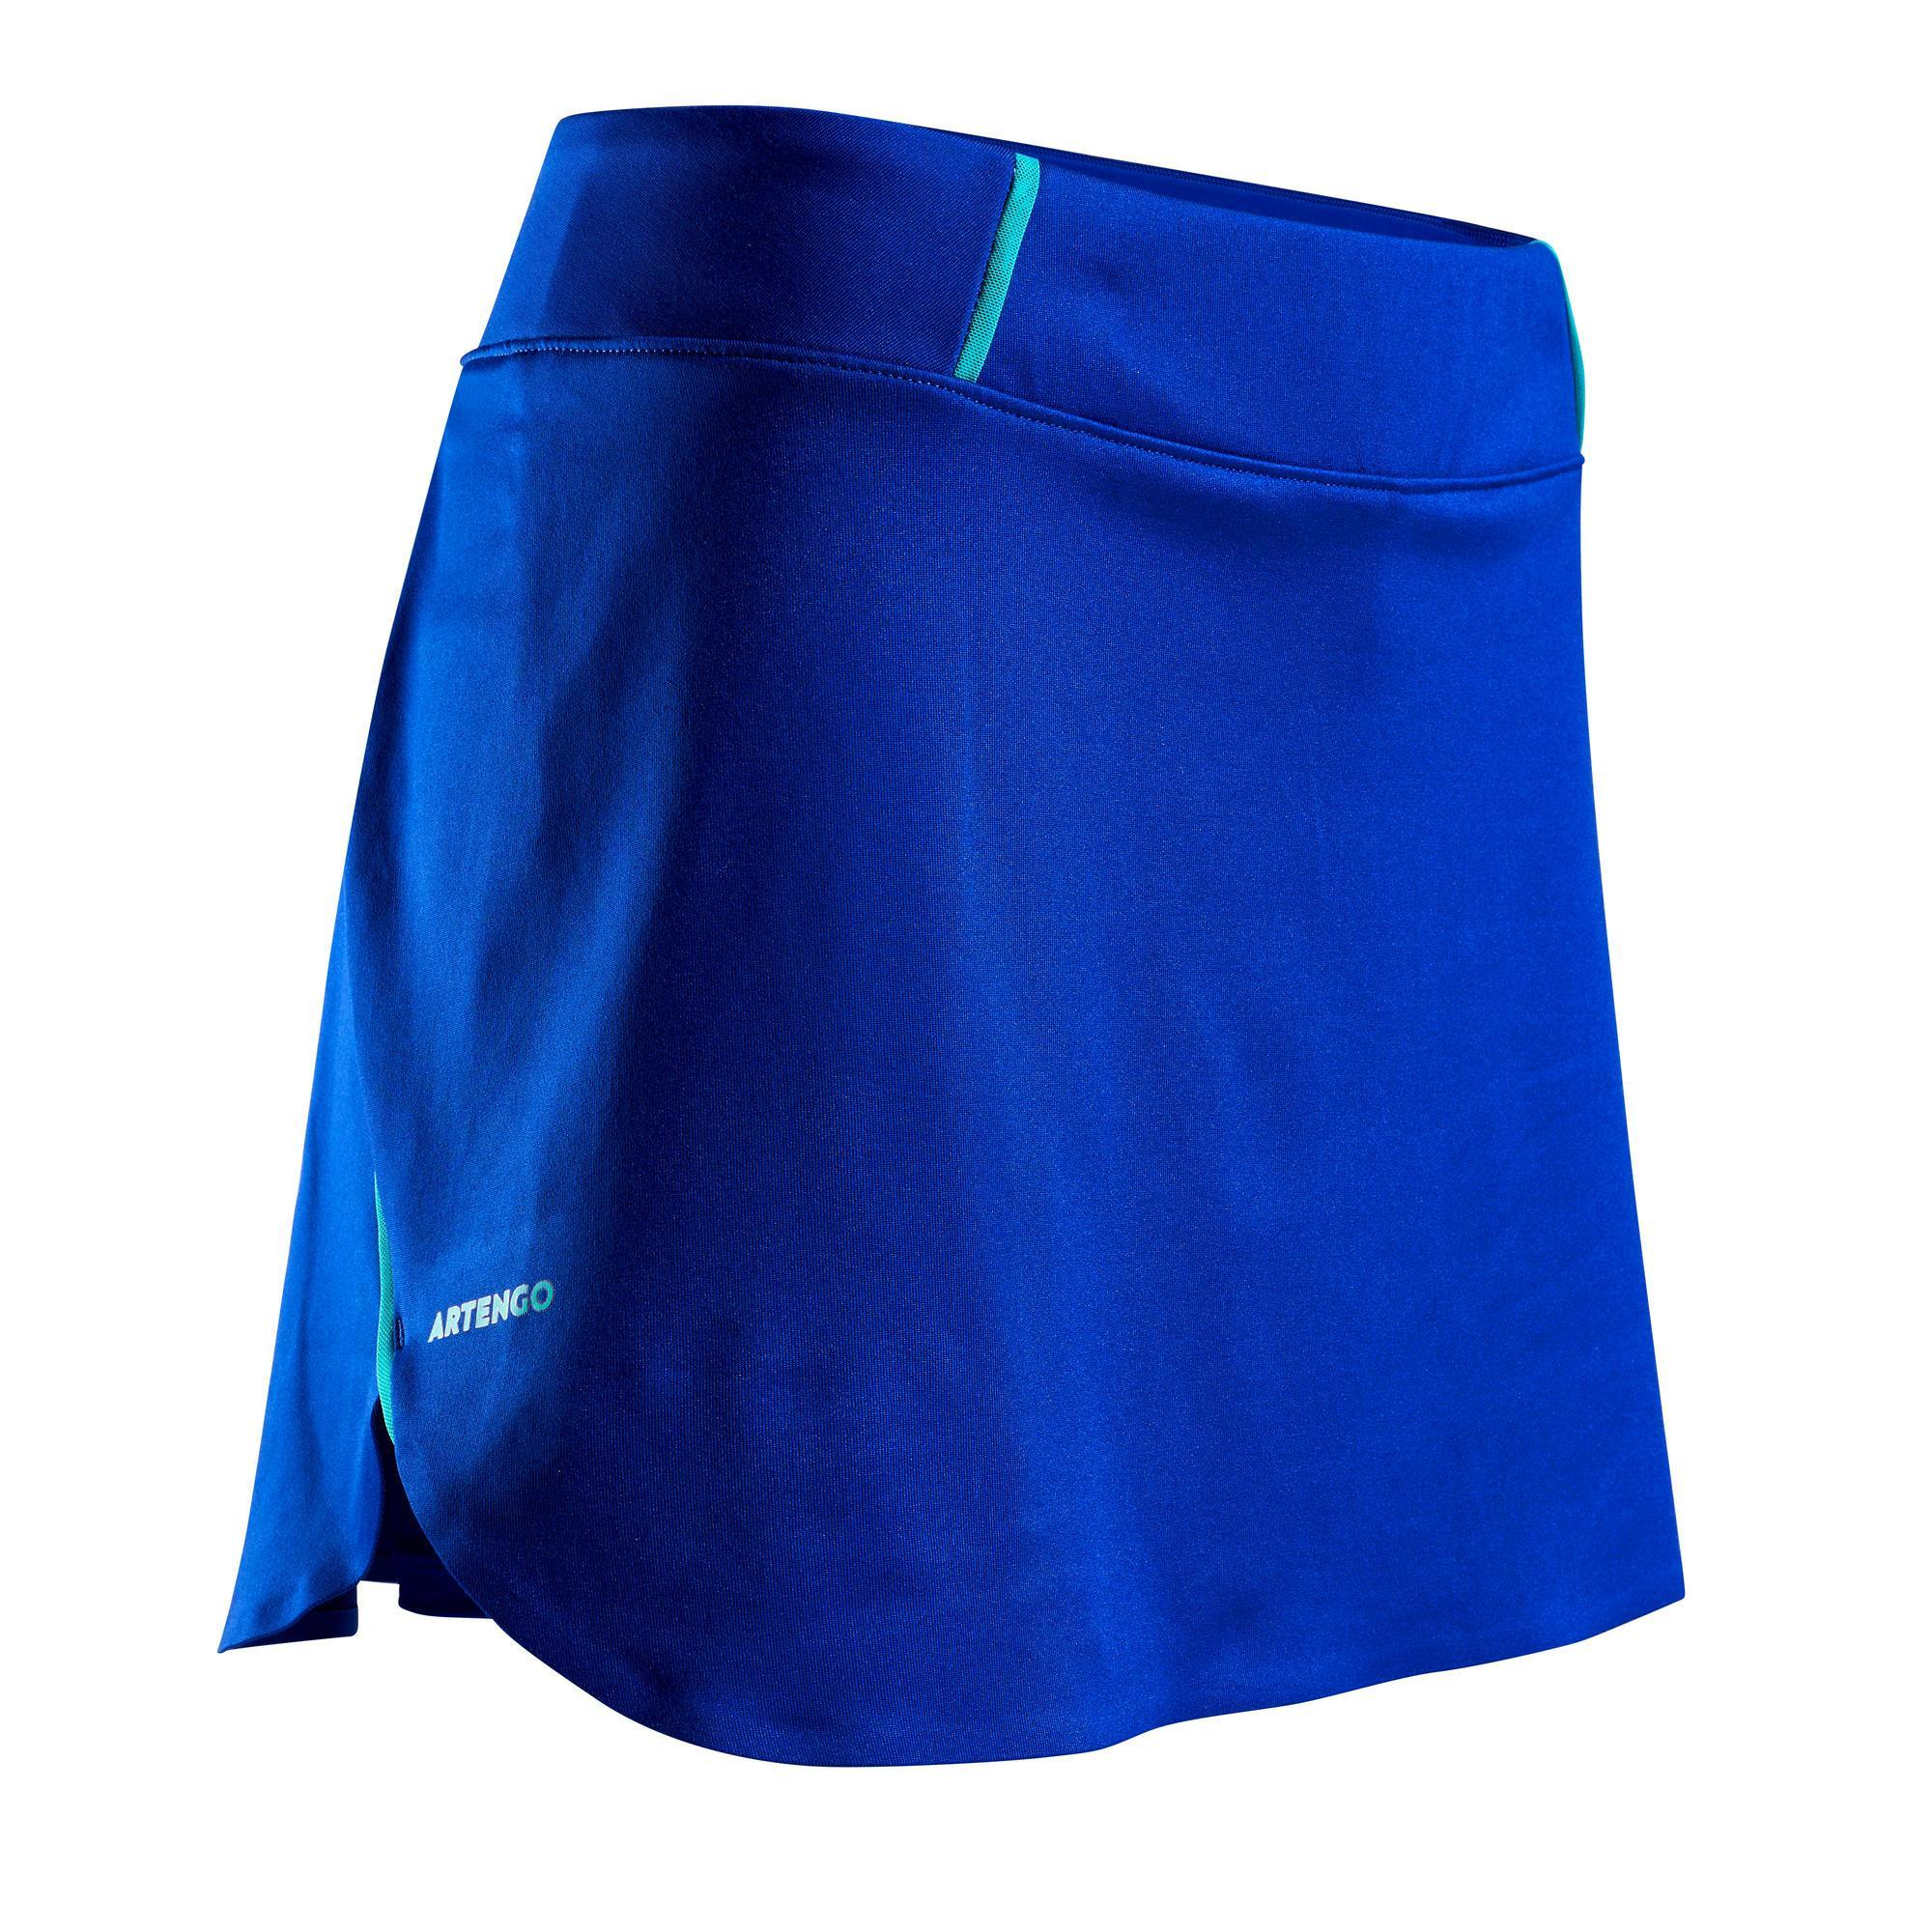 Tennisrock SK Light 990 Damen blau | Sportbekleidung > Sportröcke > Tennisröcke | Blau - Grün - Türkis | Artengo